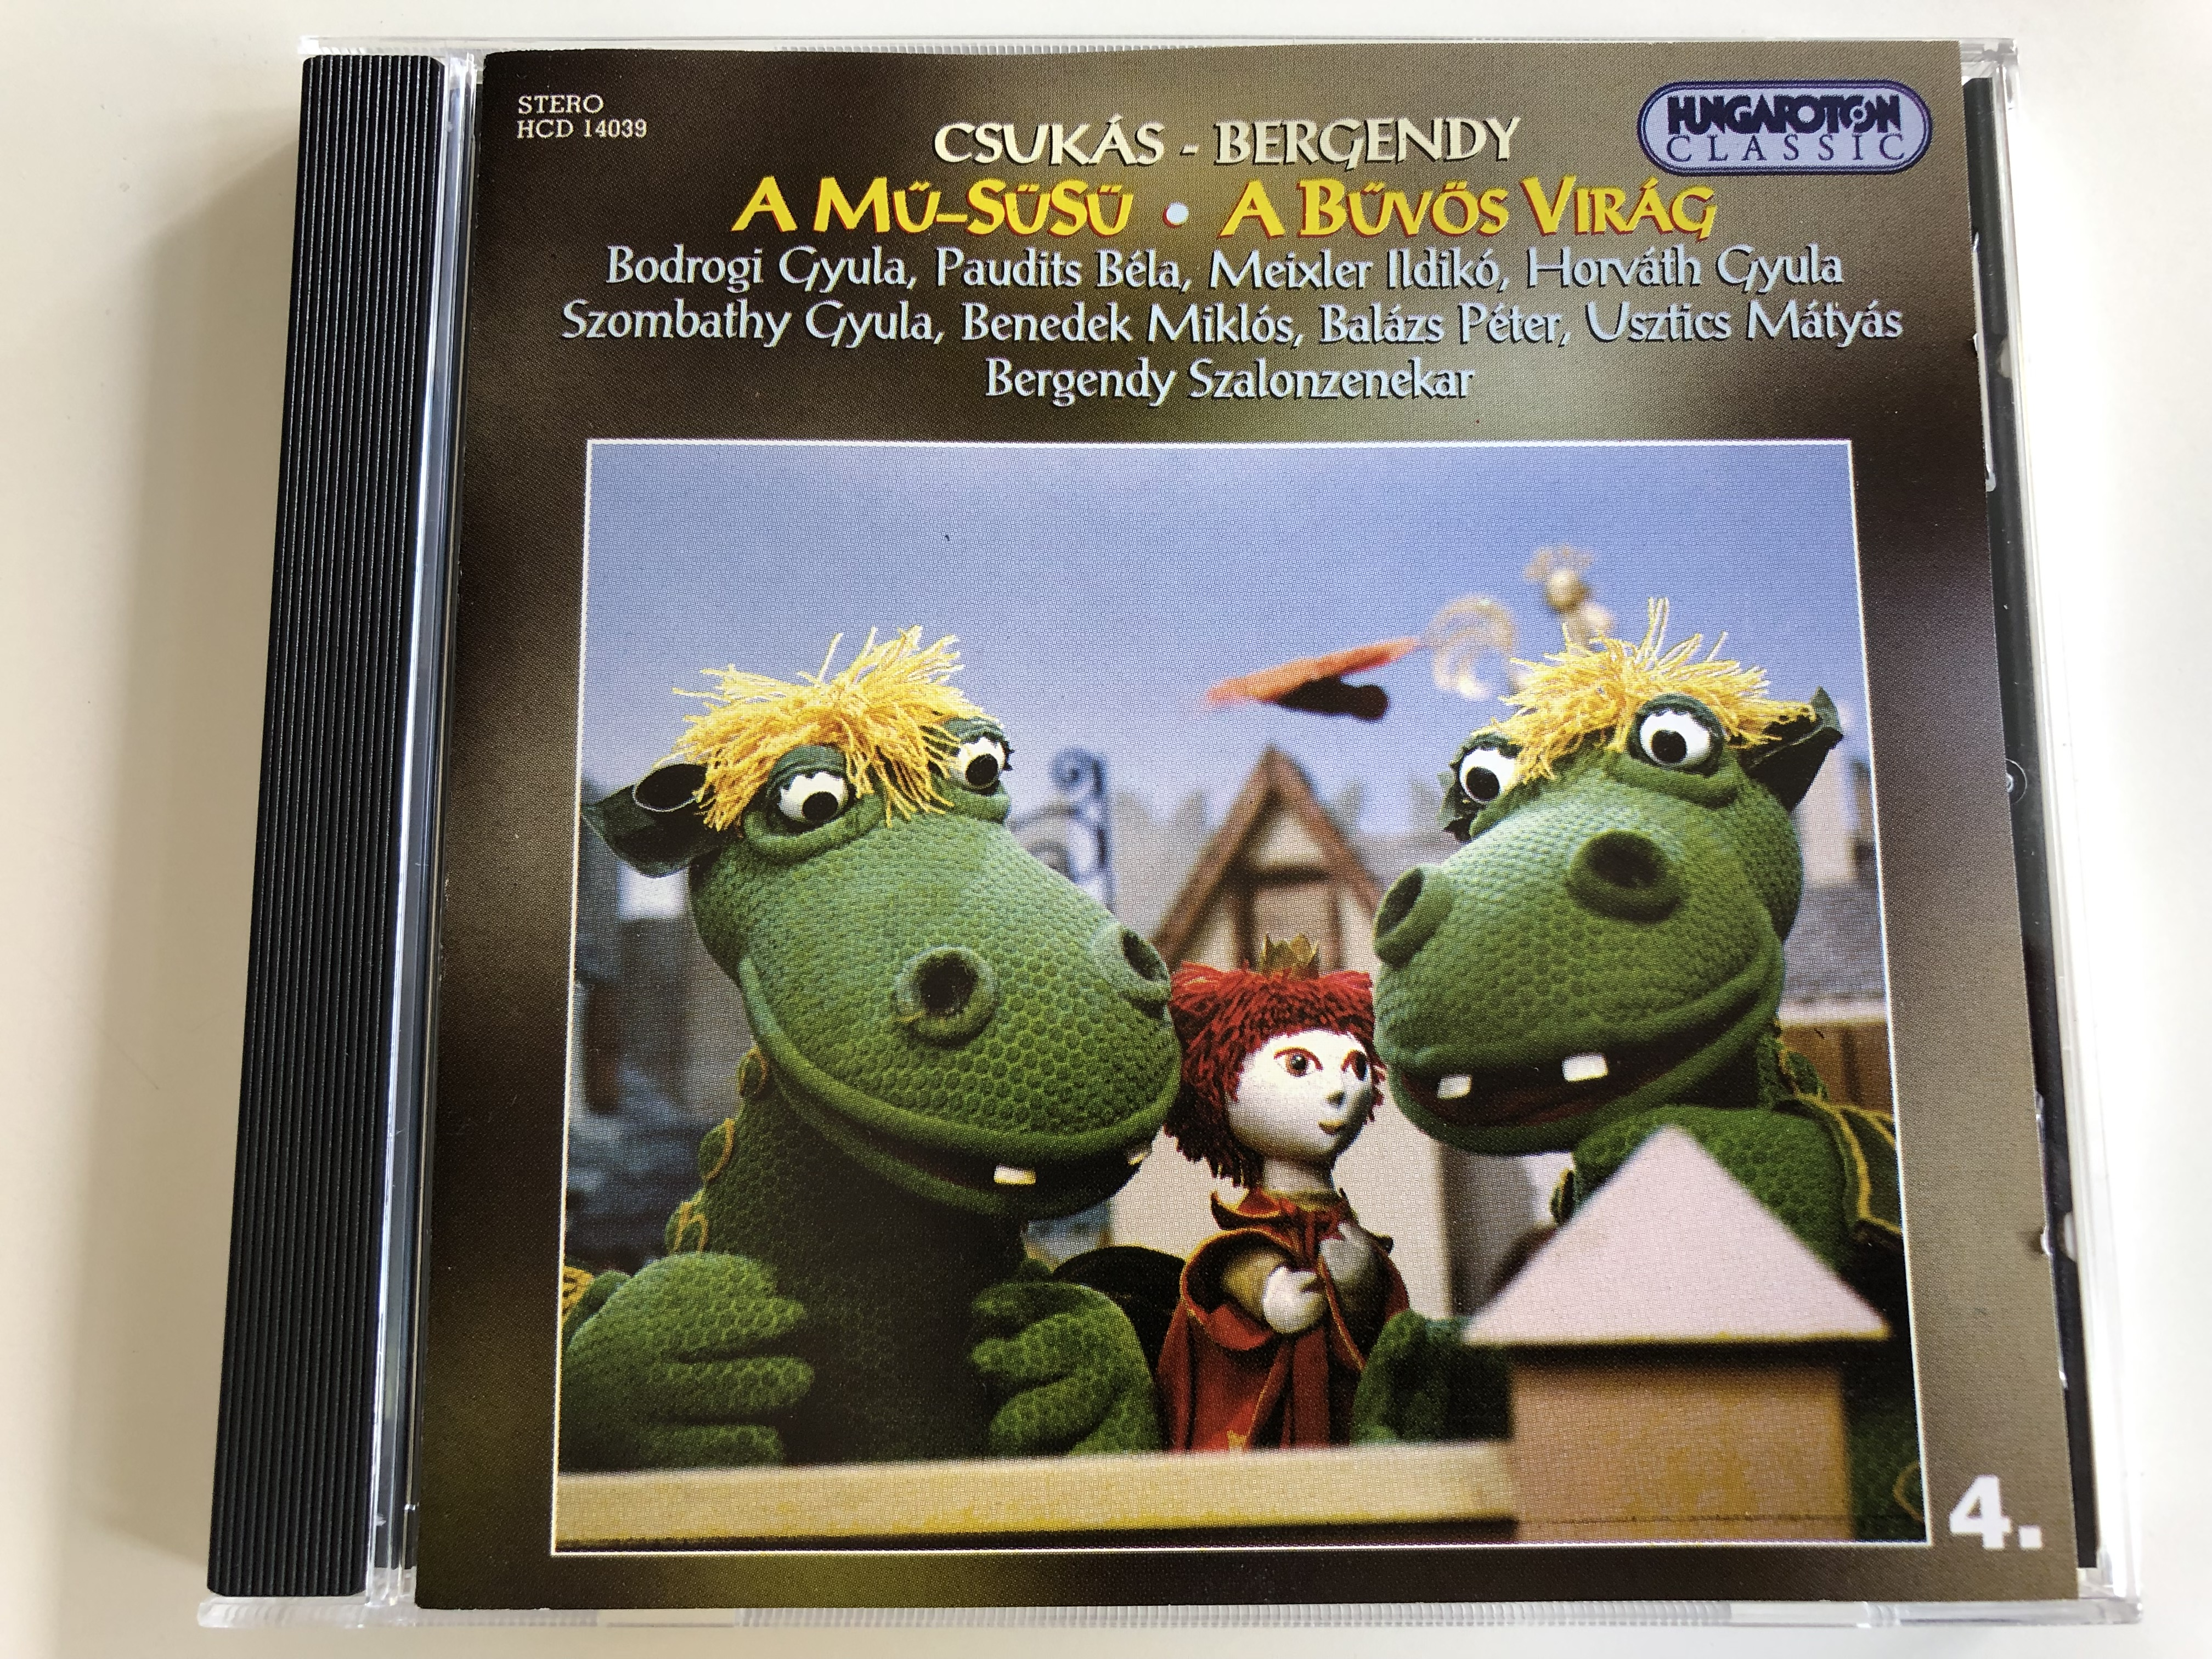 csuk-s-bergendy-a-m-s-s-a-b-v-s-vir-g-bodrogi-gyula-paudits-b-la-bal-zs-p-ter-bergendy-szalonzenekar-hungaroton-audio-cd-2001-hcd-14039-1-.jpg